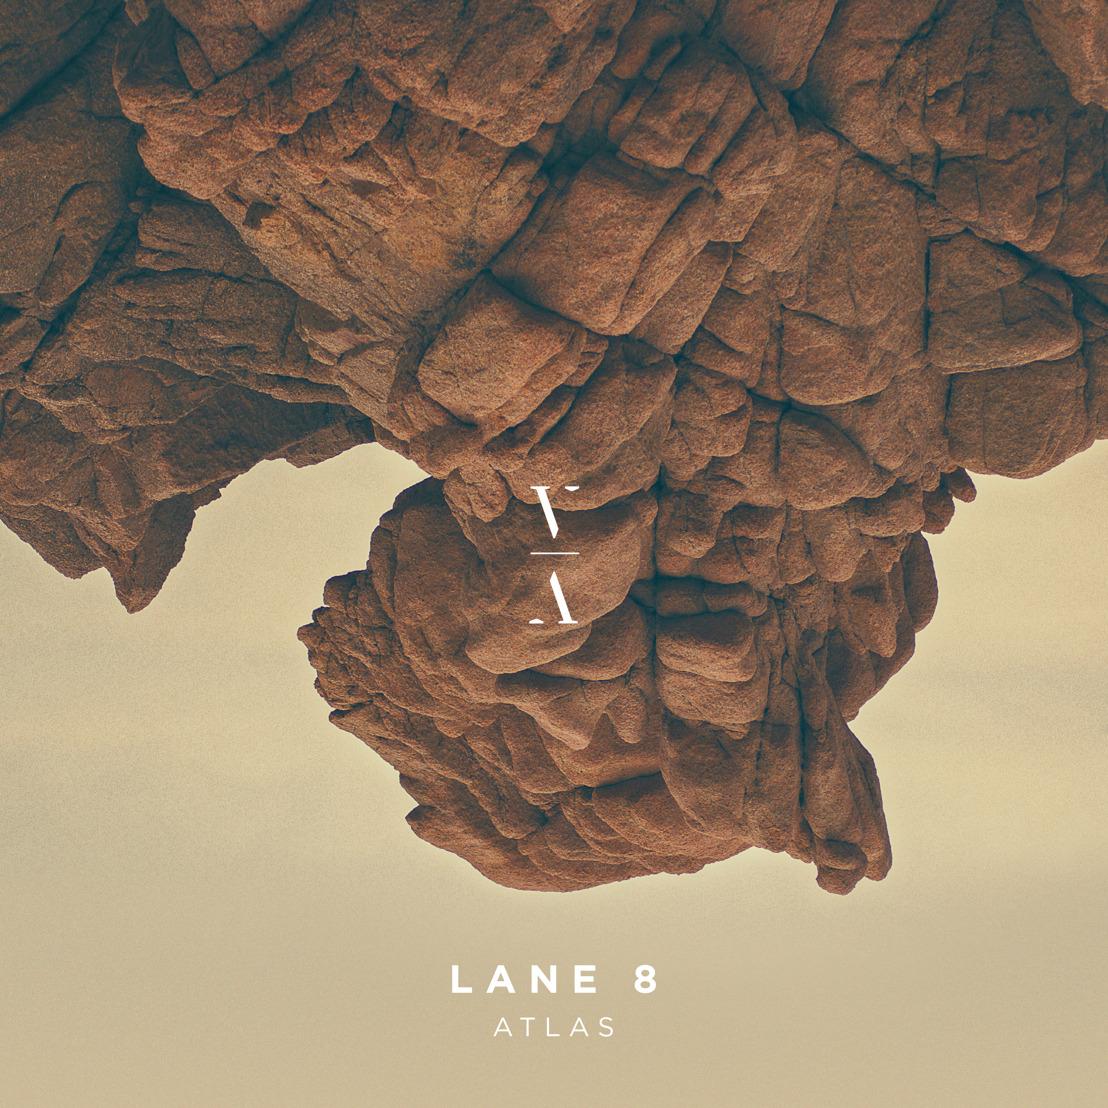 Lane 8 Releases 'Atlas' As Second Single Off 'Little By Little' Album